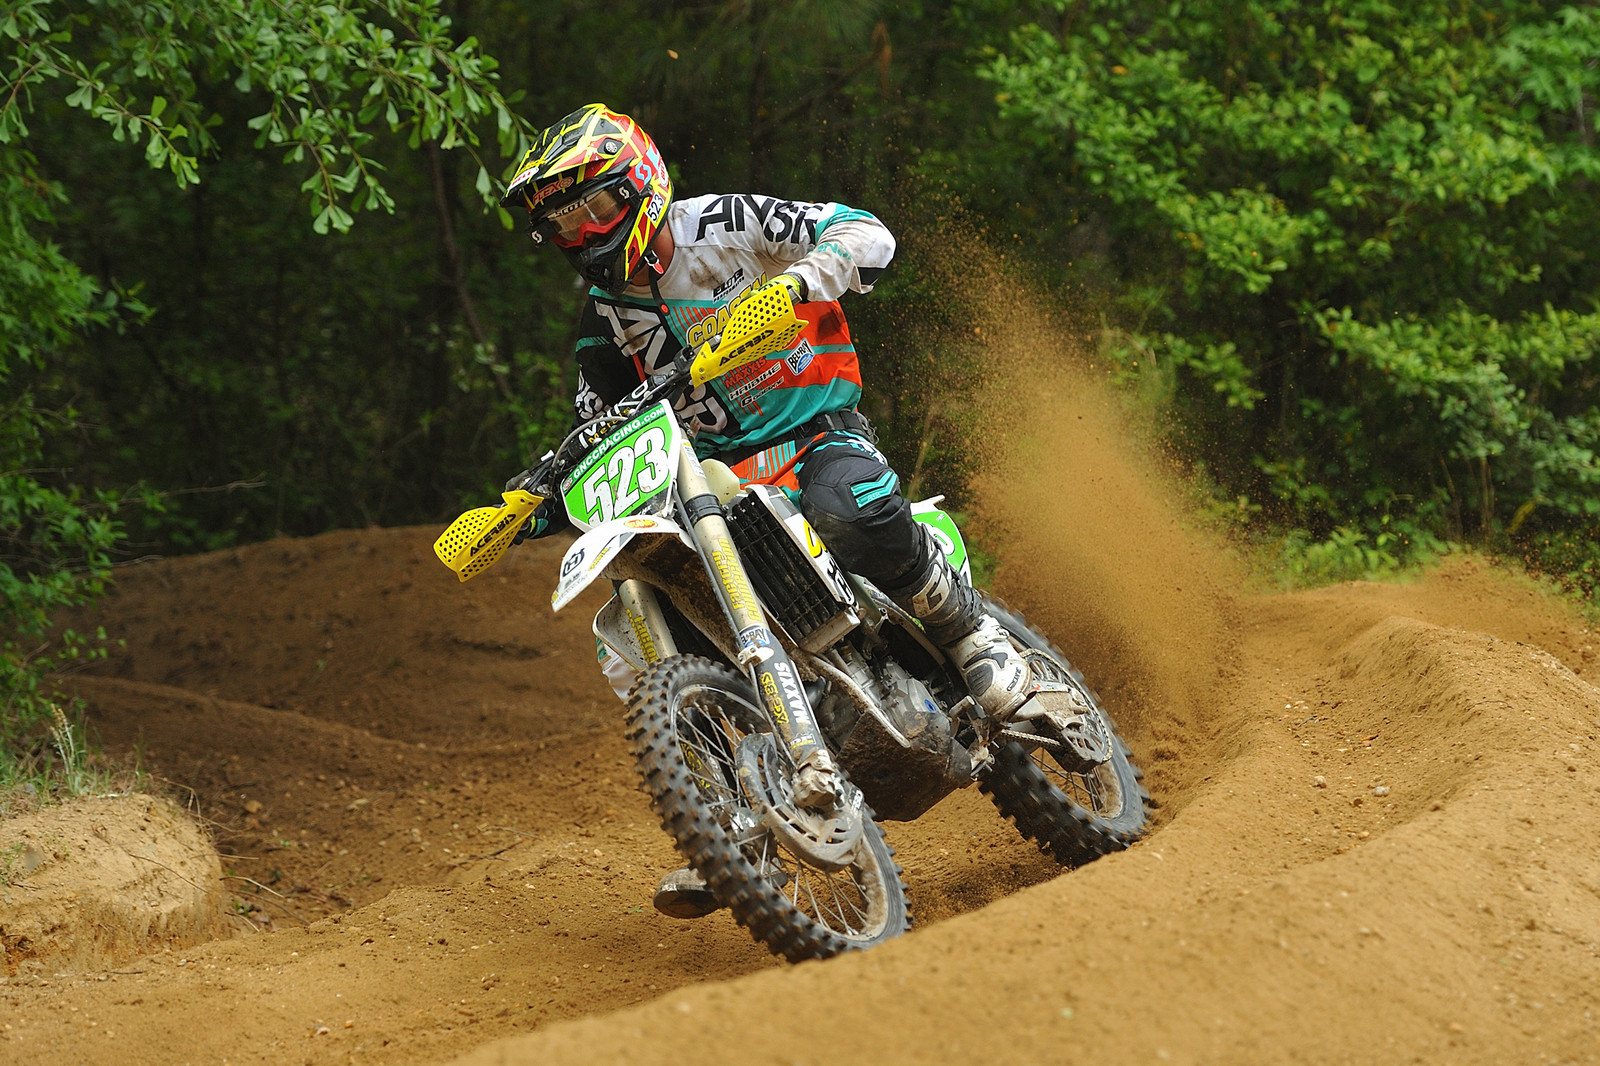 Layne Michael - GuyB - Motocross Pictures - Vital MX